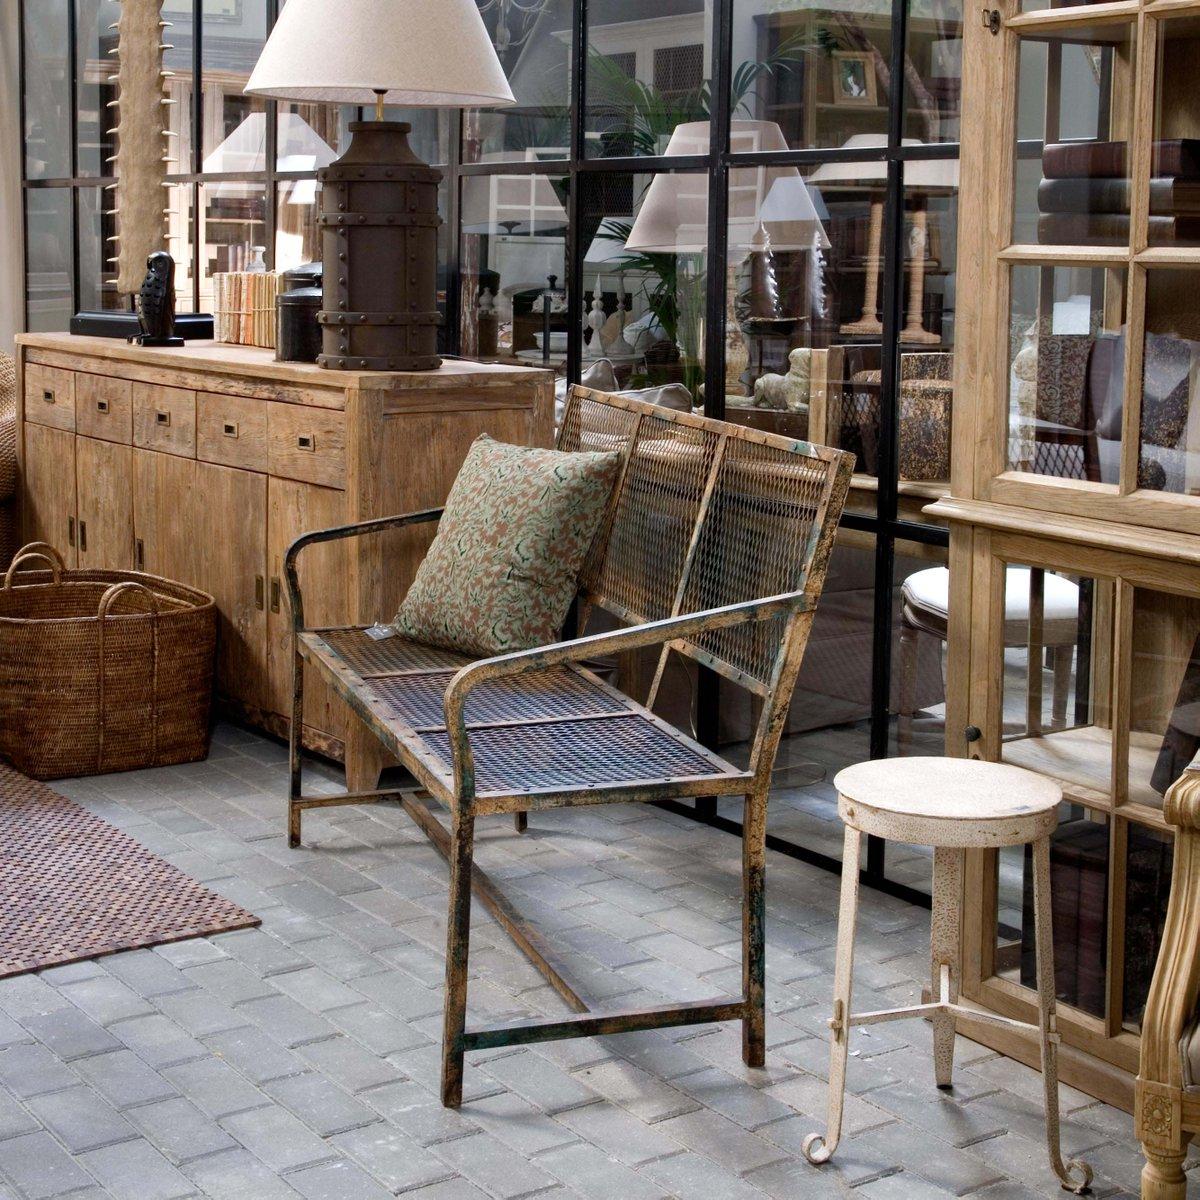 Muebles becara segunda mano obtenga ideas dise o de muebles para su hogar aqu - Segunda mano pamplona muebles ...